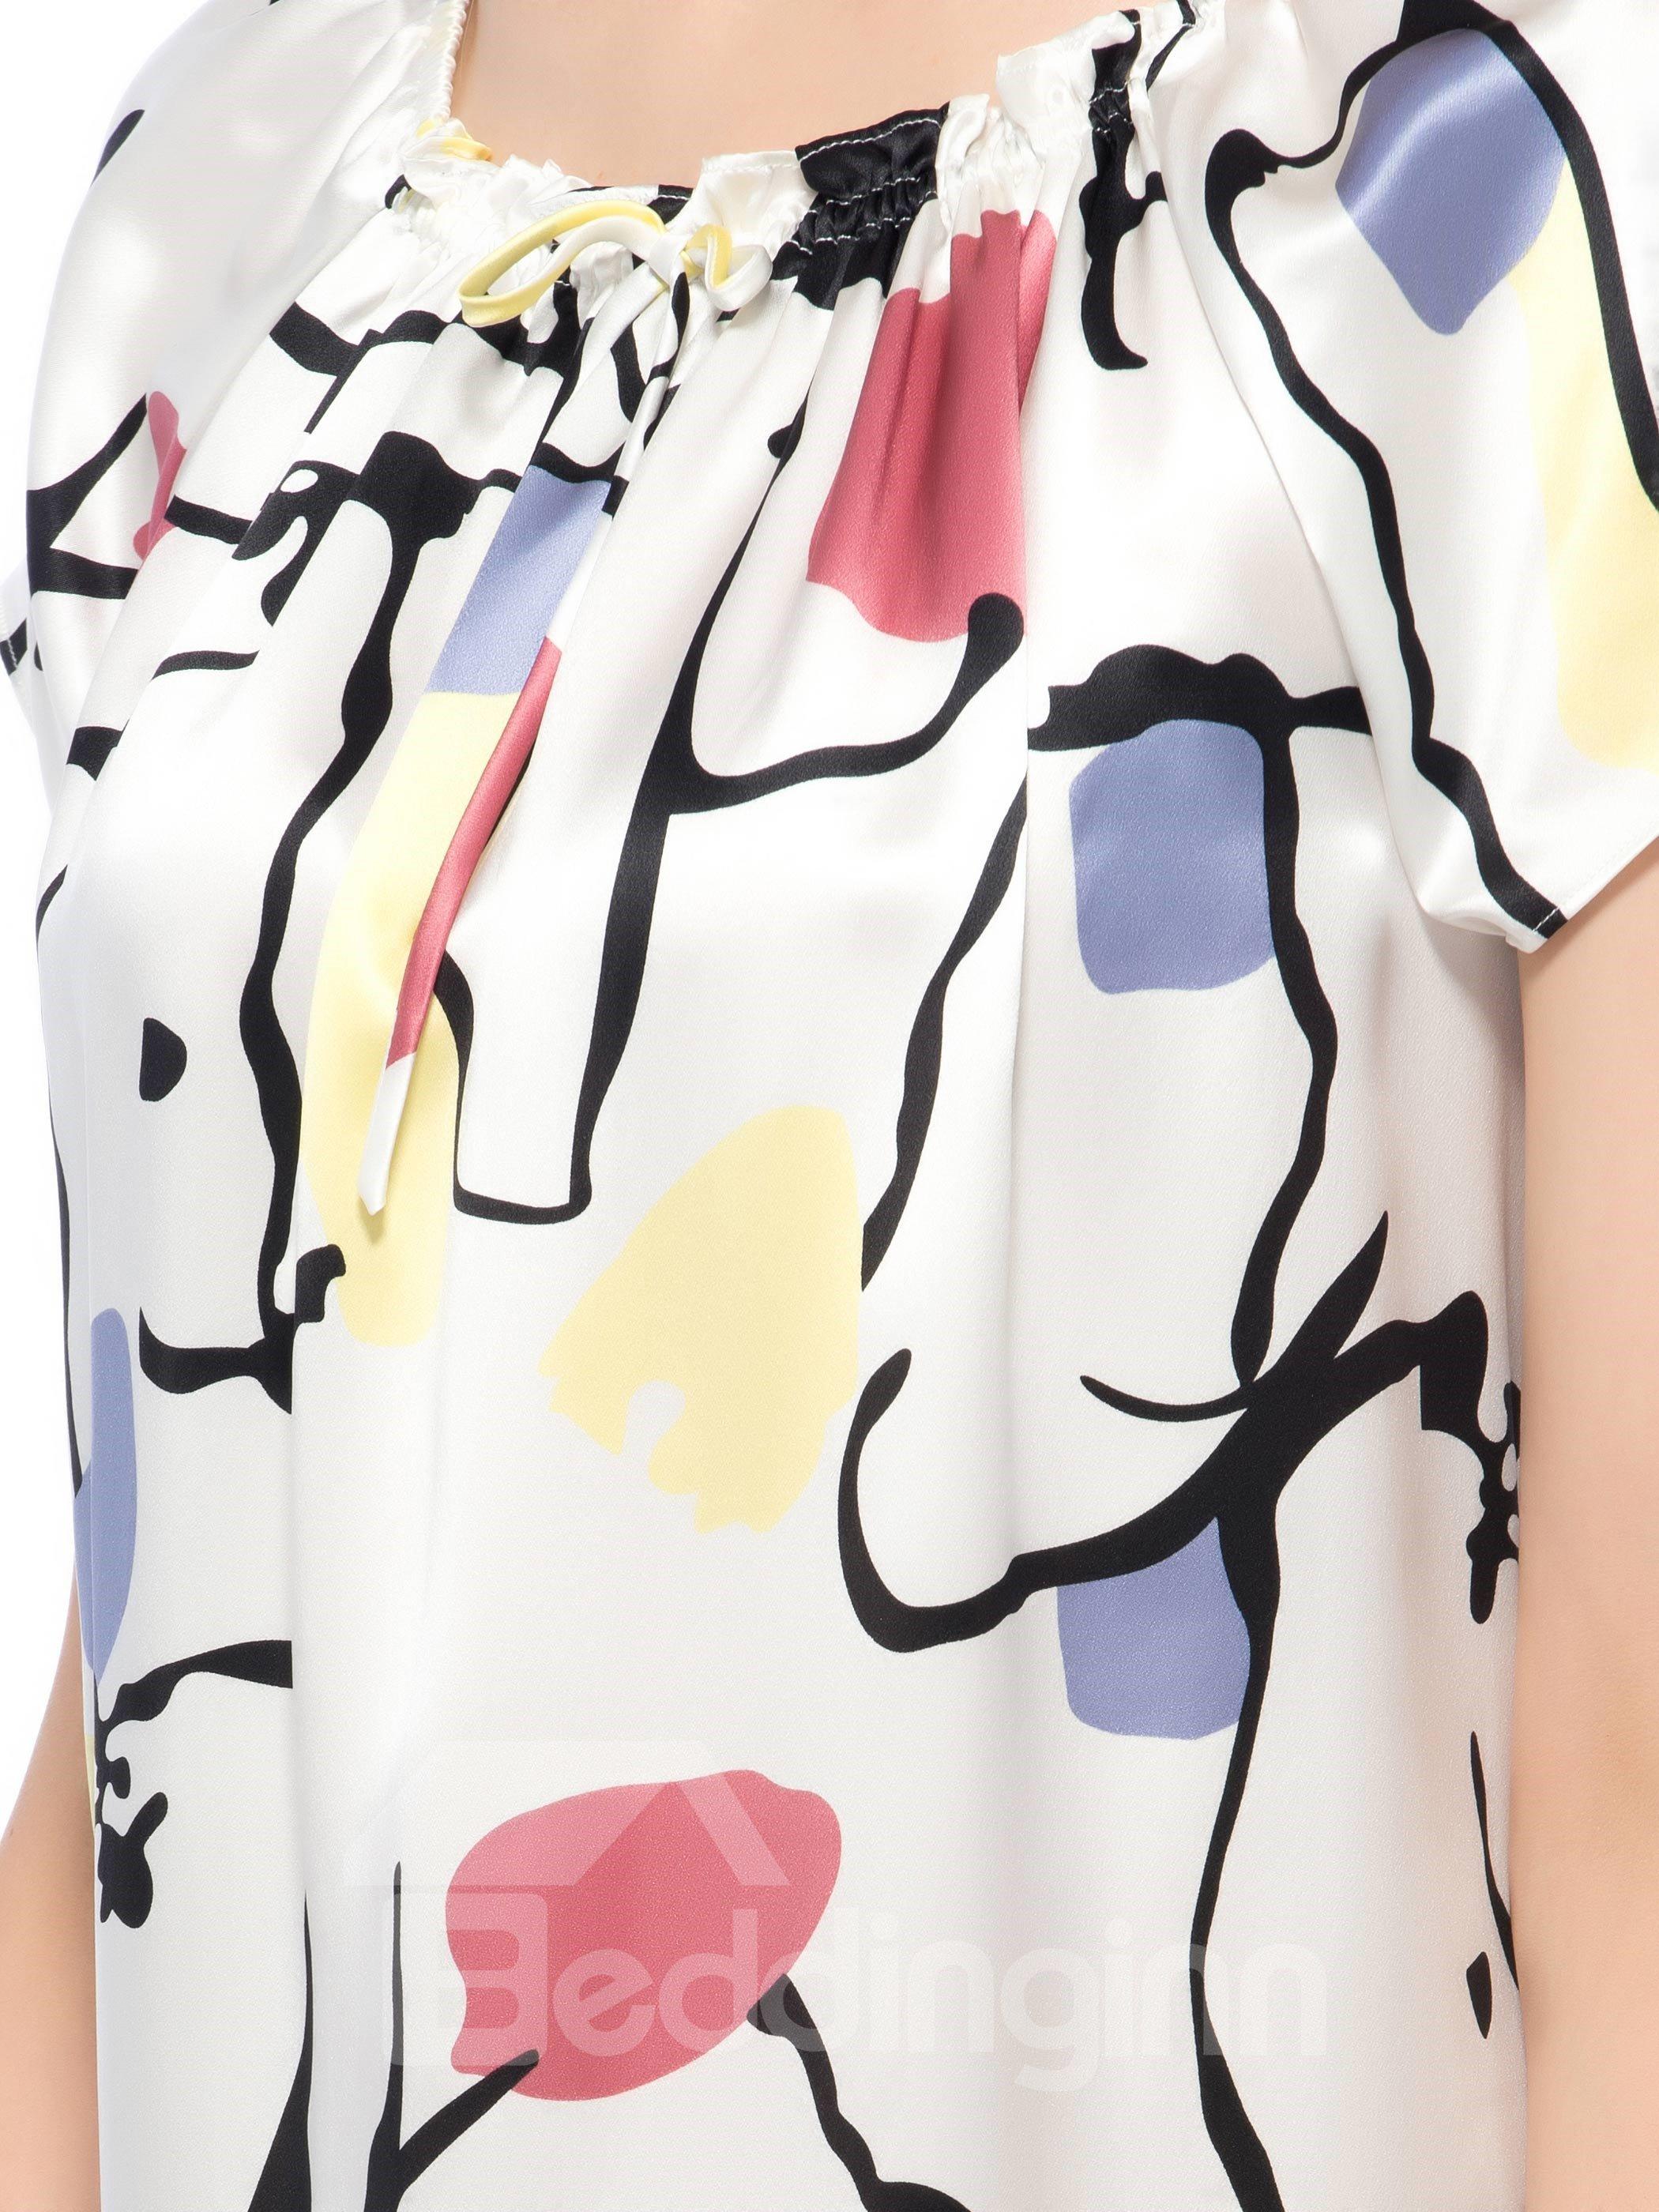 Minimalist Stretch Neckline Flouncing Hem Silk Nightgown